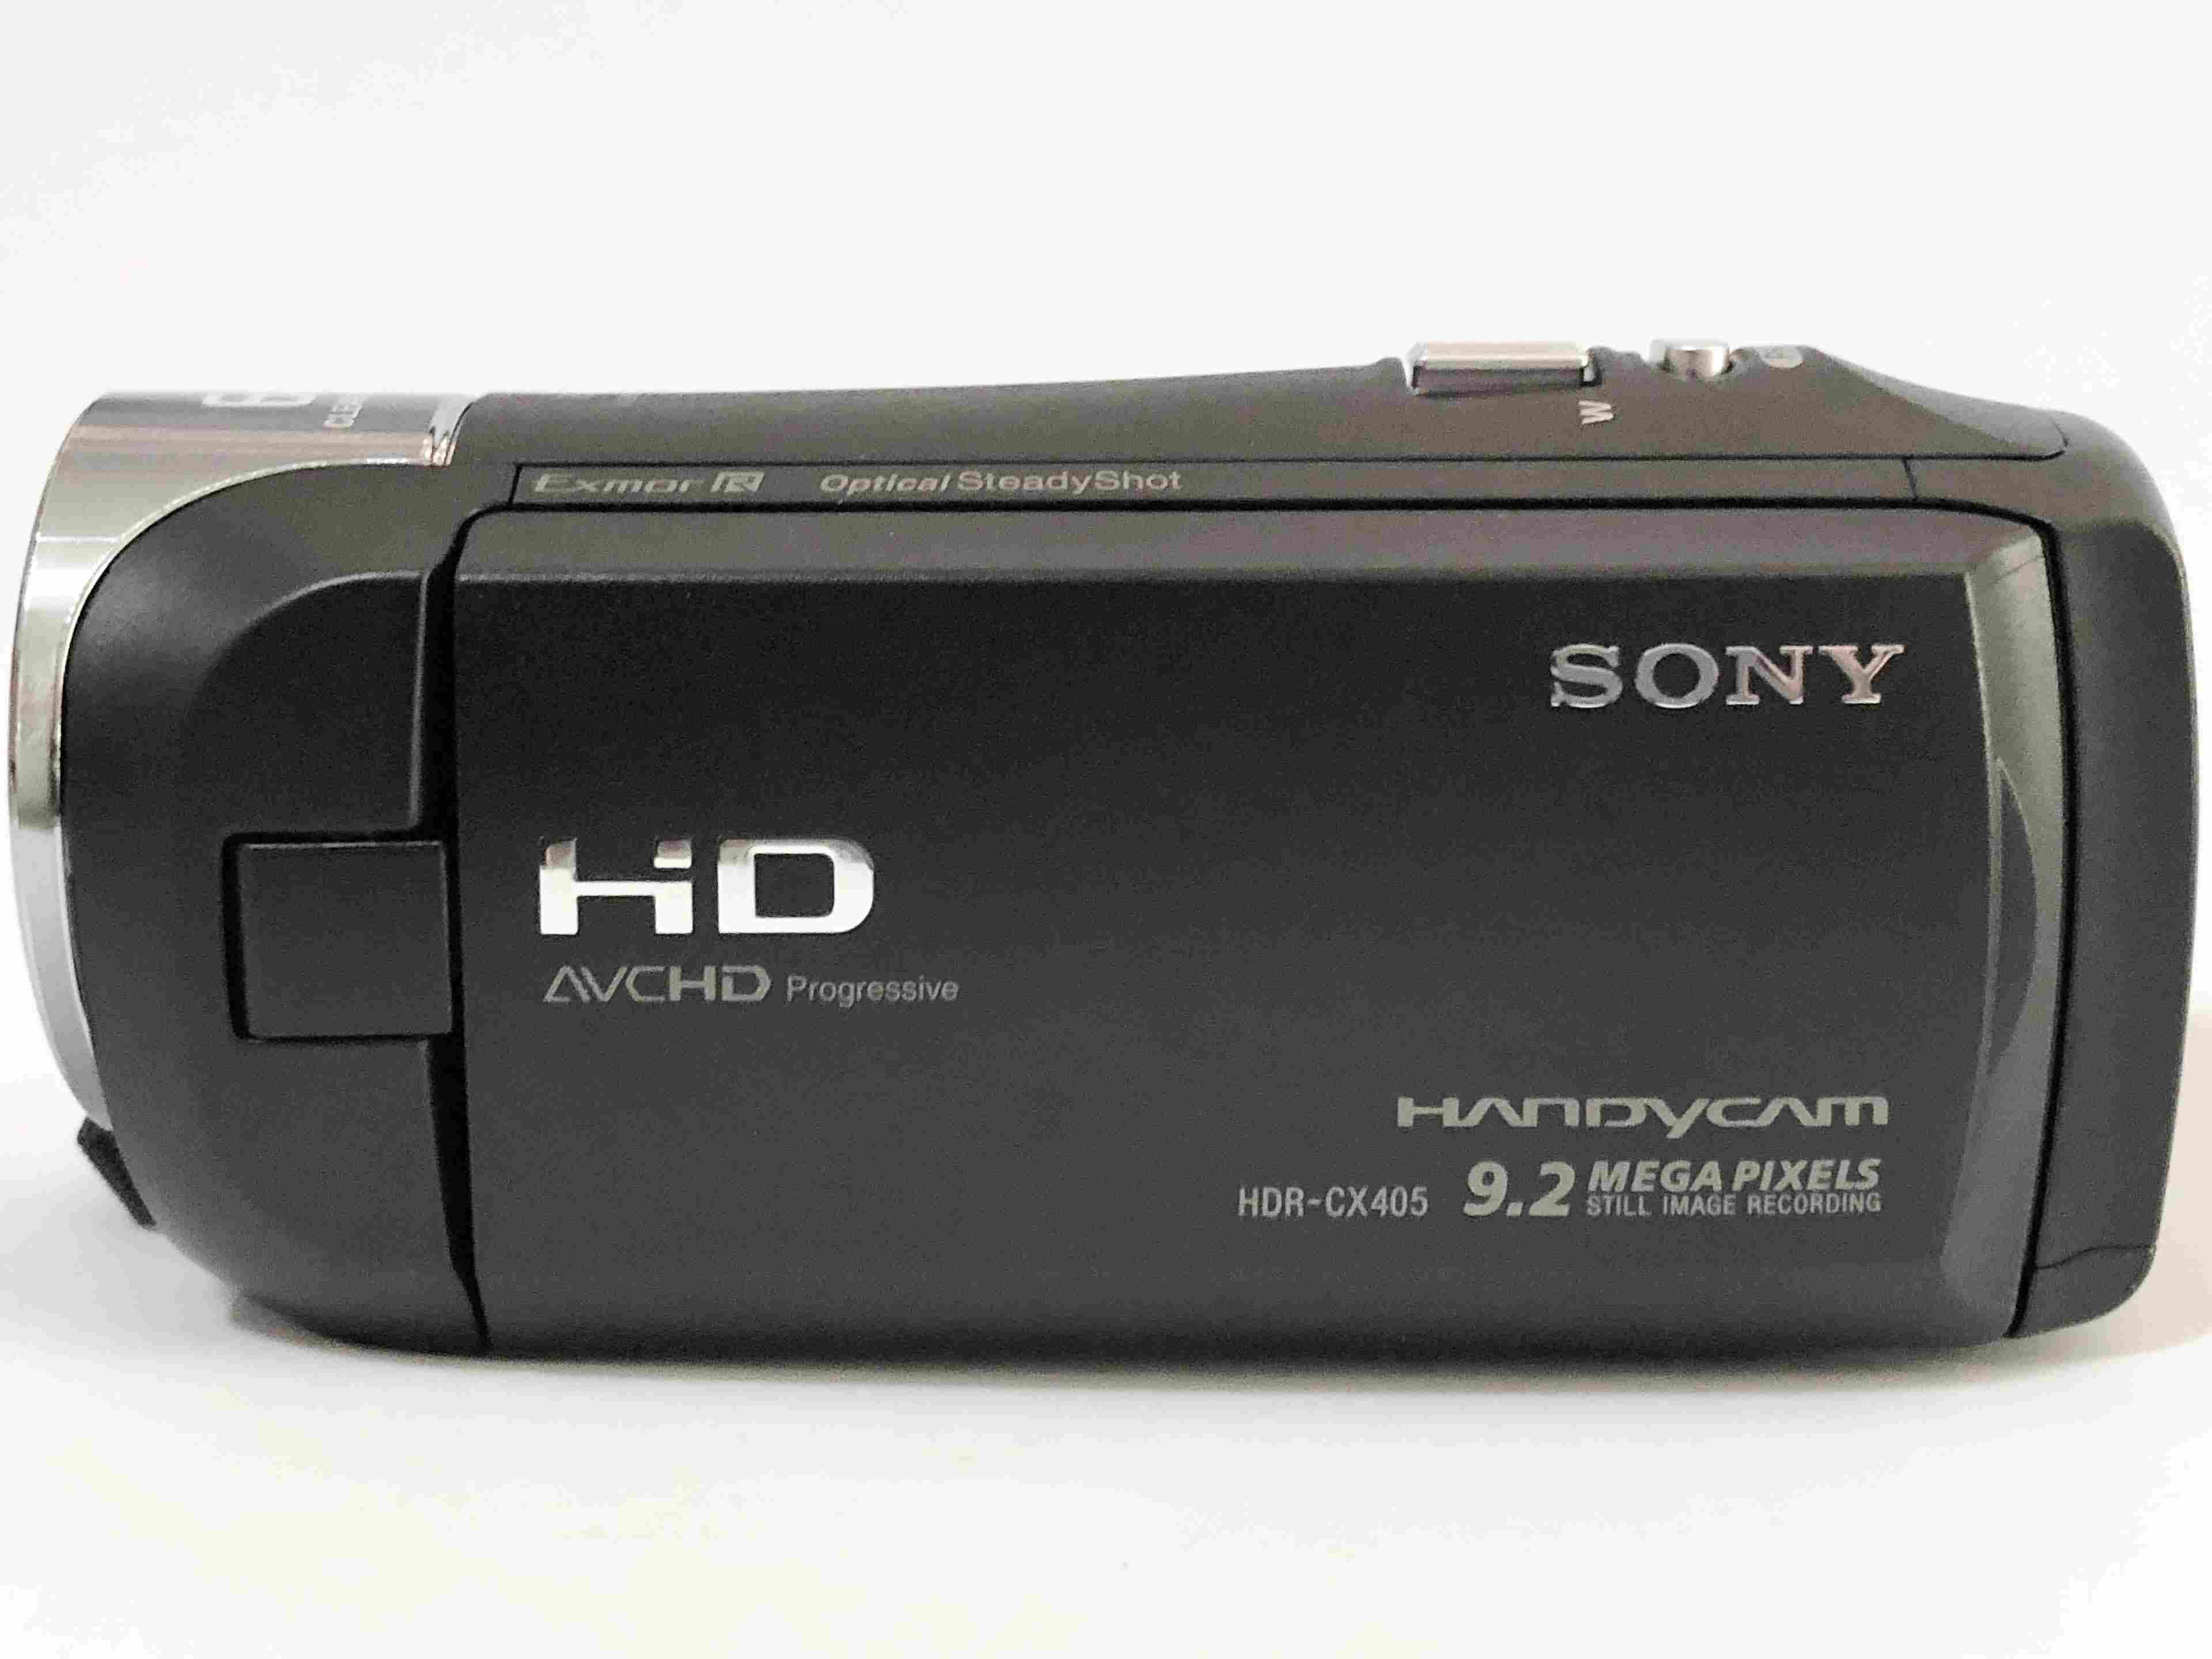 Connecting Panasonic Hd Video Camera Michaelieclark Camcorder Hc Wx970 4k Ultra Sideleft 5ba4208746e0fb00253bb0a4